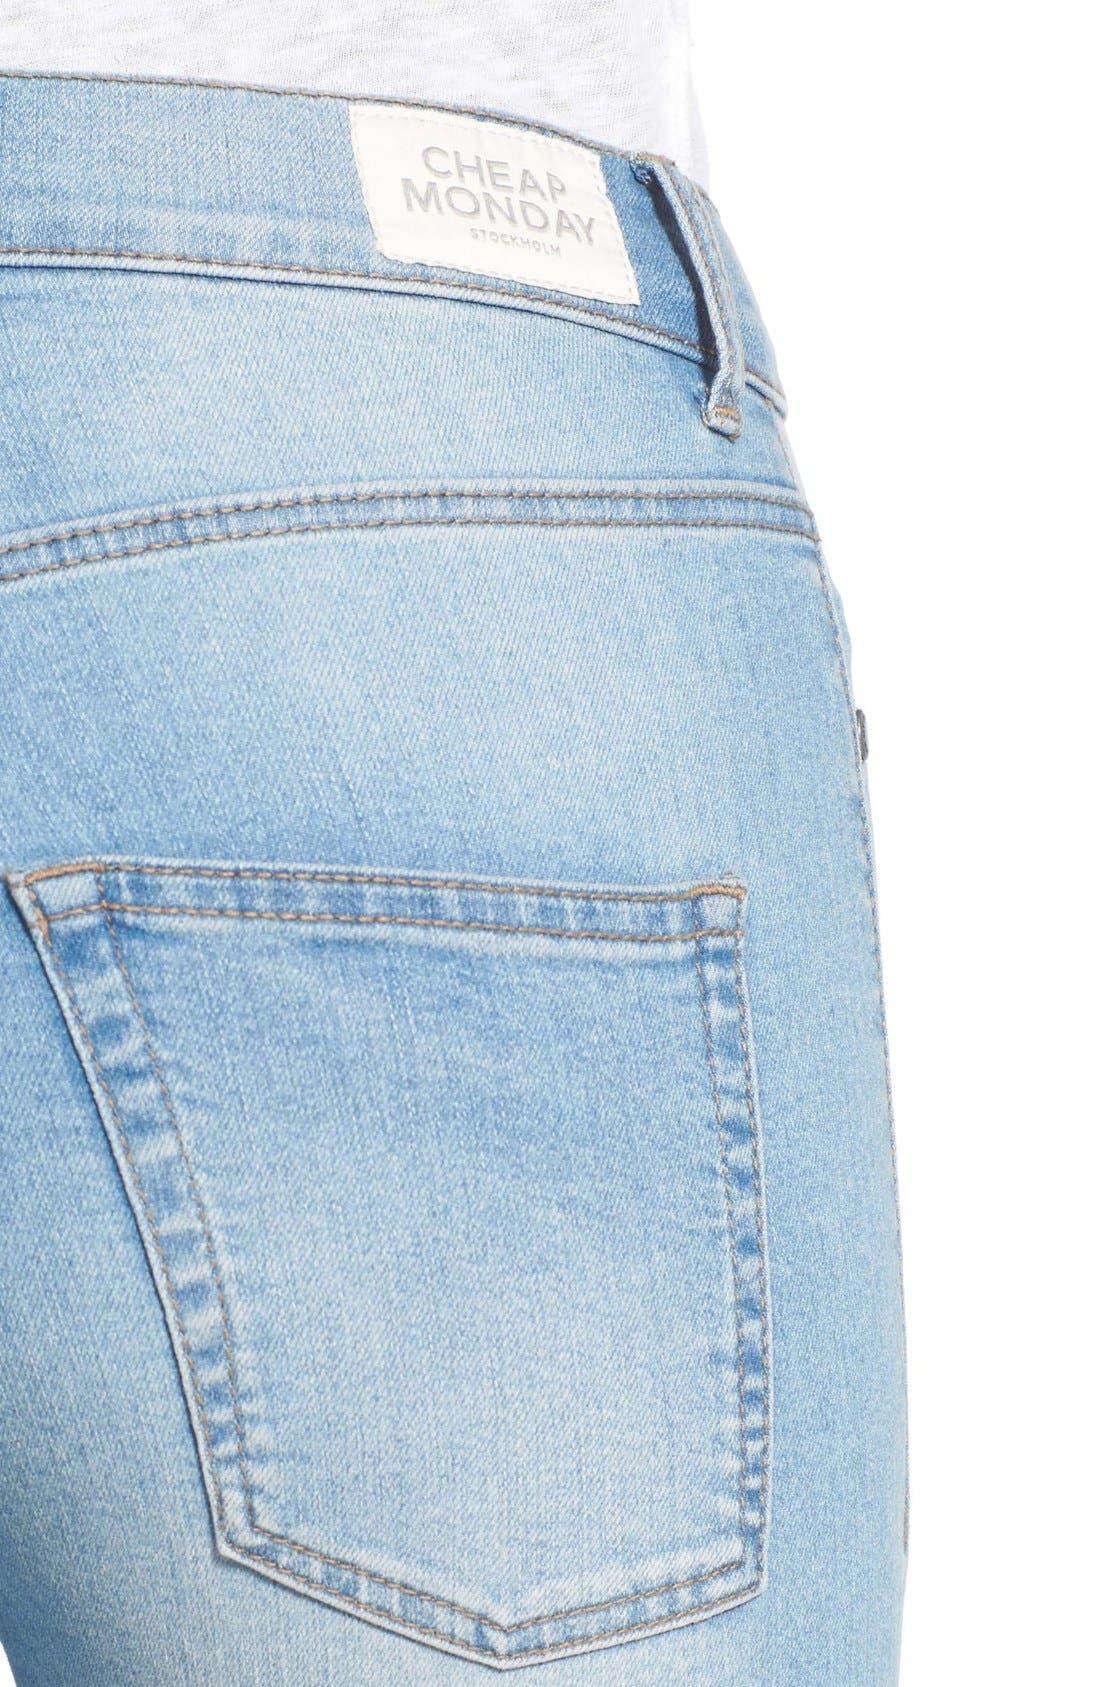 Alternate Image 4  - Cheap Monday 'High Spray' High Rise Skinny Jeans (Stone Bleach)